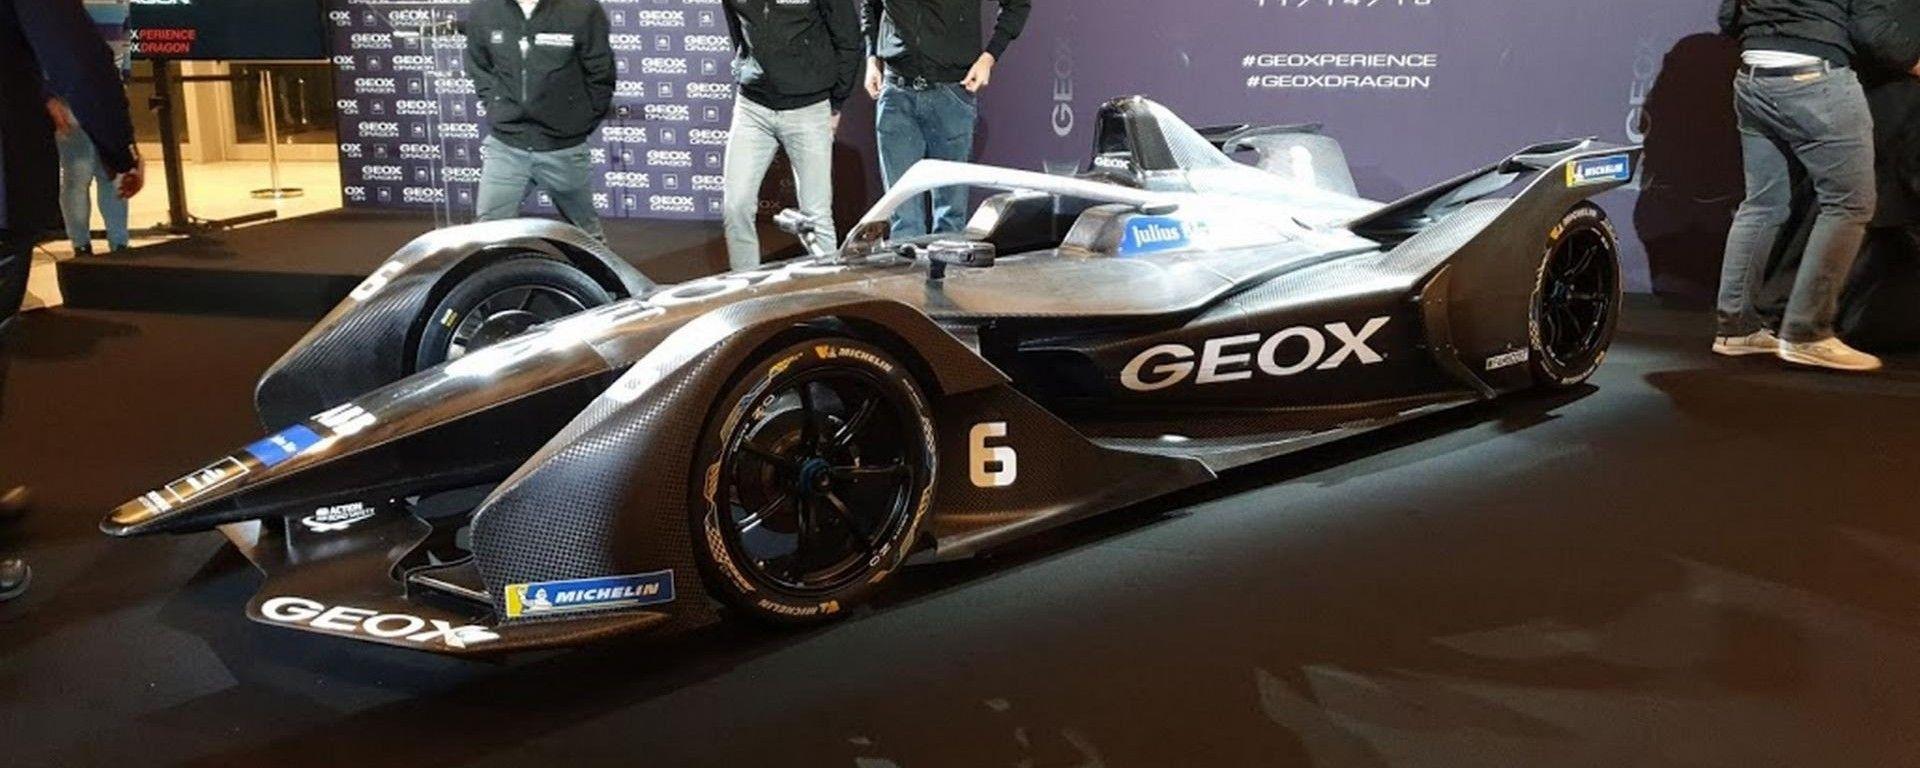 Formula E 2019: Geox Dragon Team